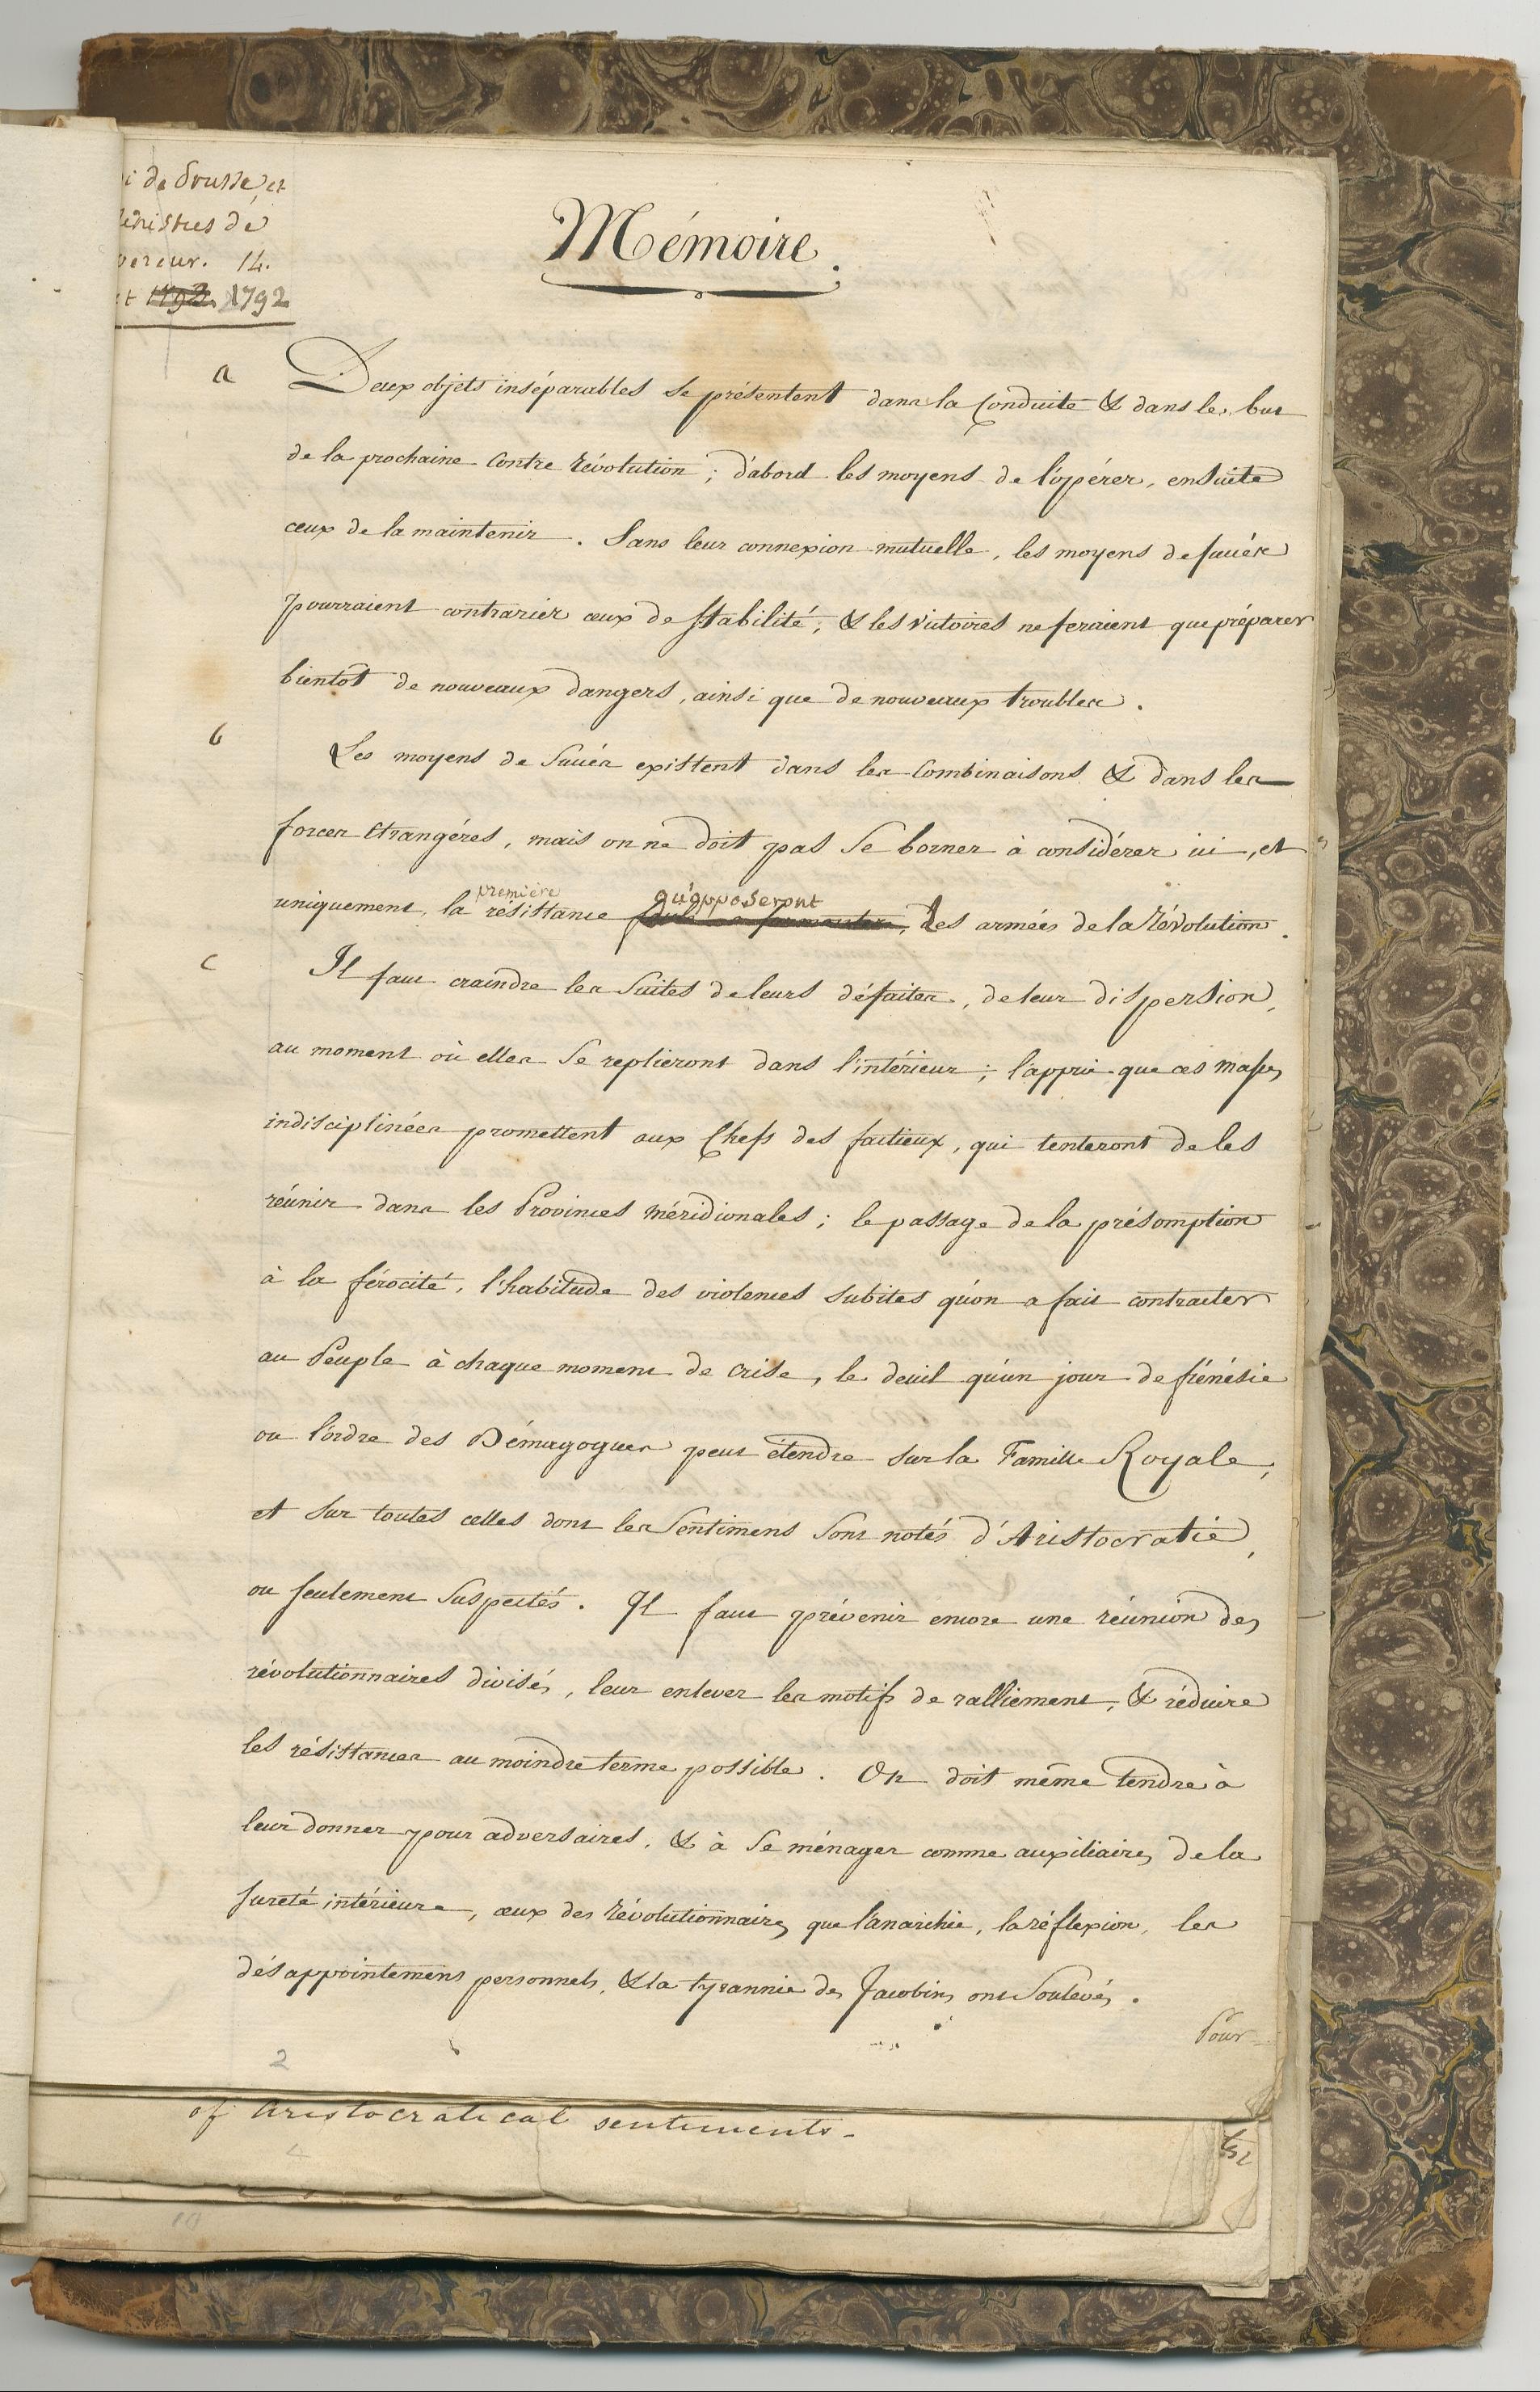 Image of folio 1 of manuscript Memoire composed by Jacques Mallet du Pan